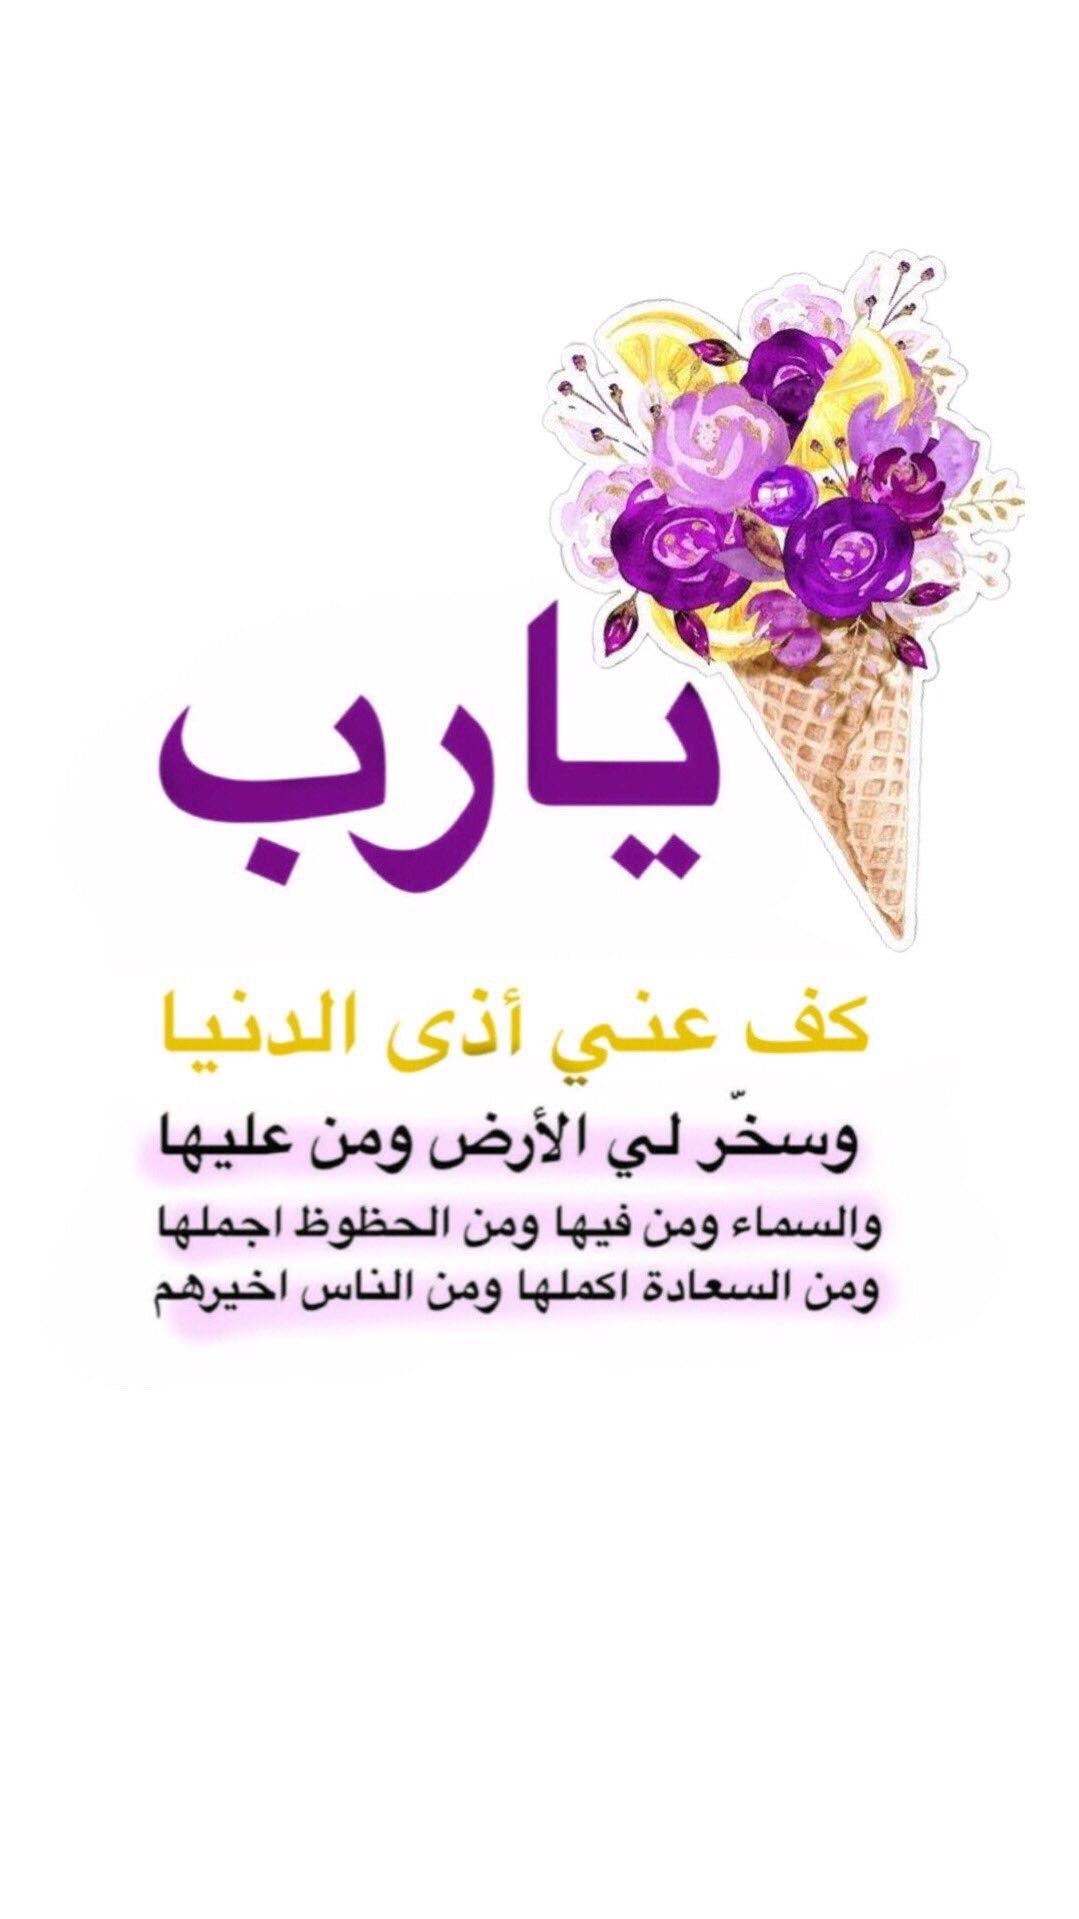 Pin By الأثر الجميل On دعاء Beautiful Islamic Quotes Islamic Quotes Quotes